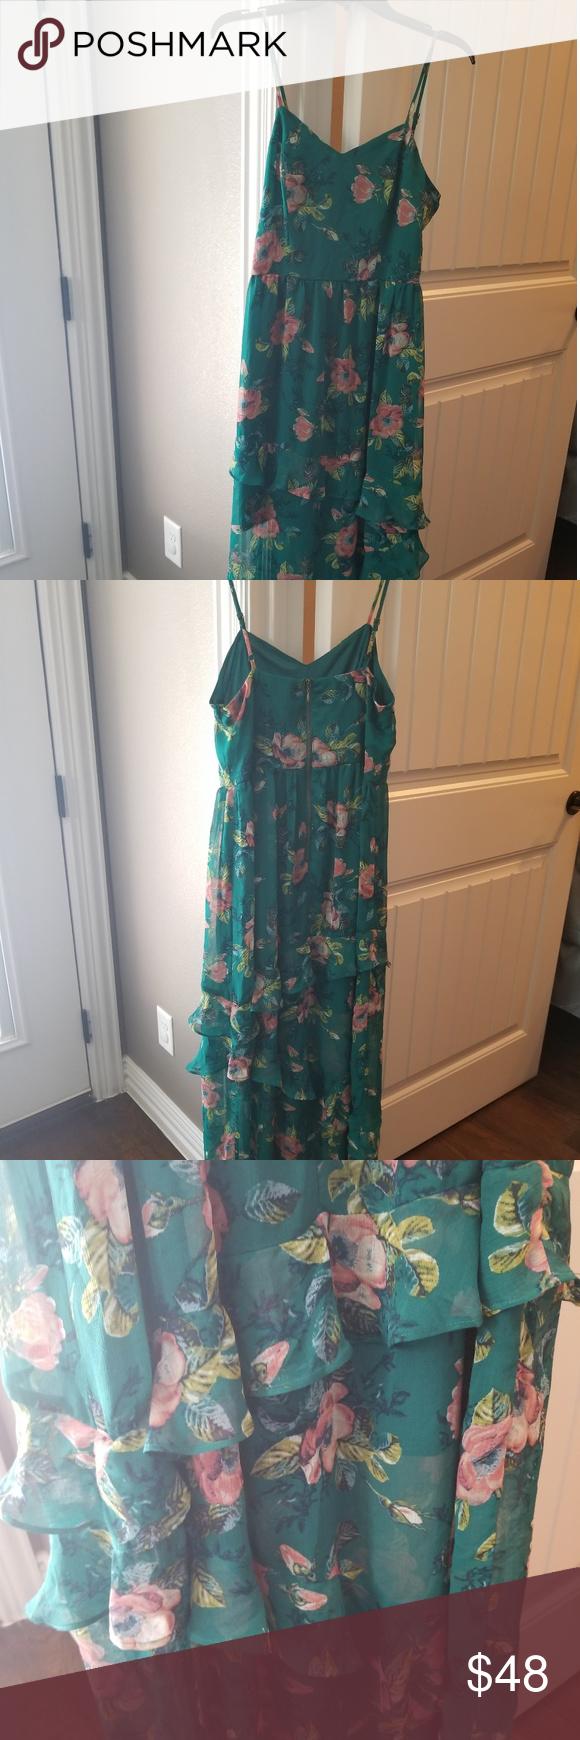 New Xhilaration Maxi Dress Dresses Spaghetti Strap Dresses Xhilaration [ 1740 x 580 Pixel ]